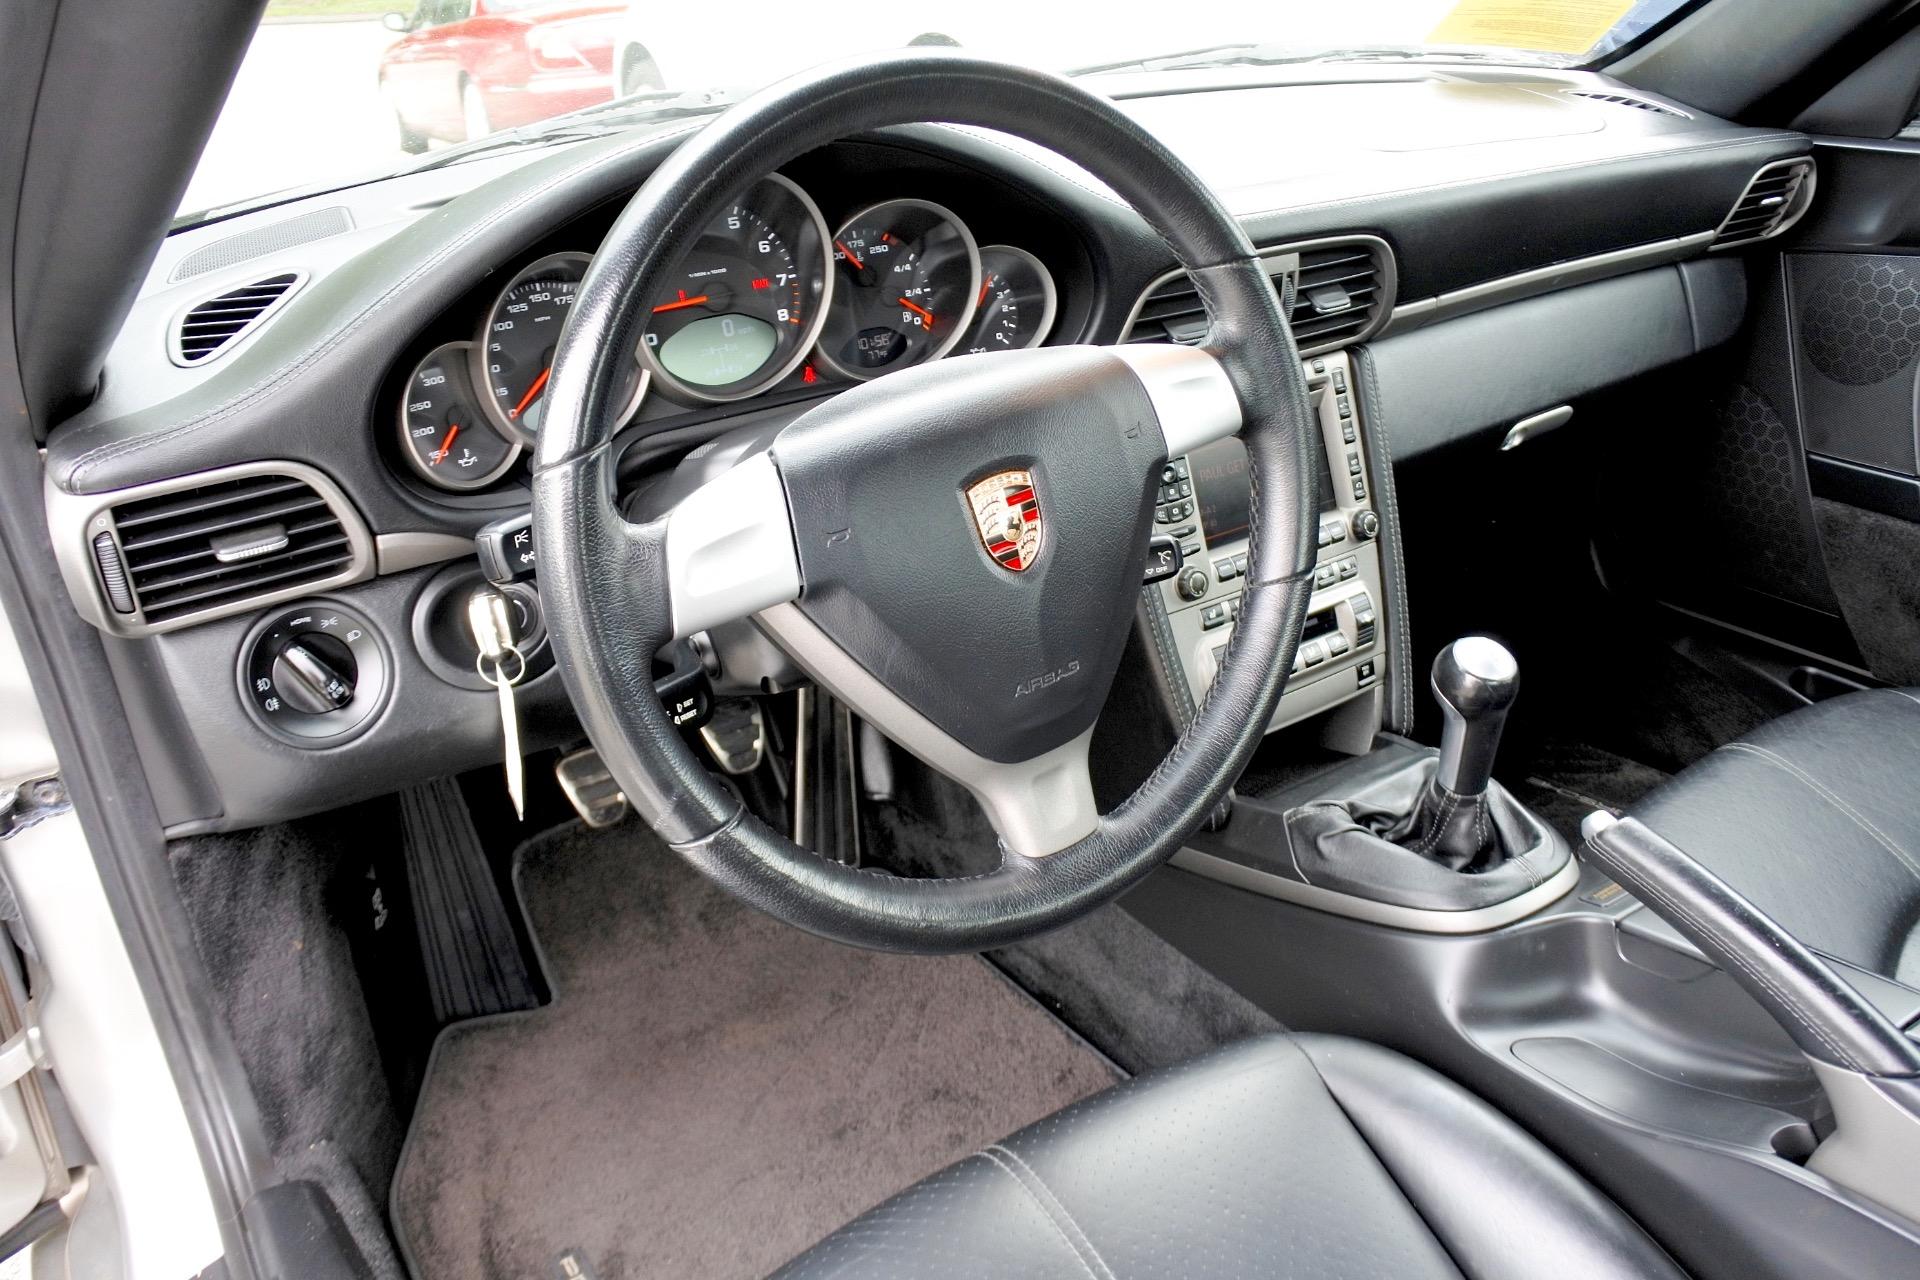 Used 2006 Porsche 911 Carrera 4 Used 2006 Porsche 911 Carrera 4 for sale  at Metro West Motorcars LLC in Shrewsbury MA 13